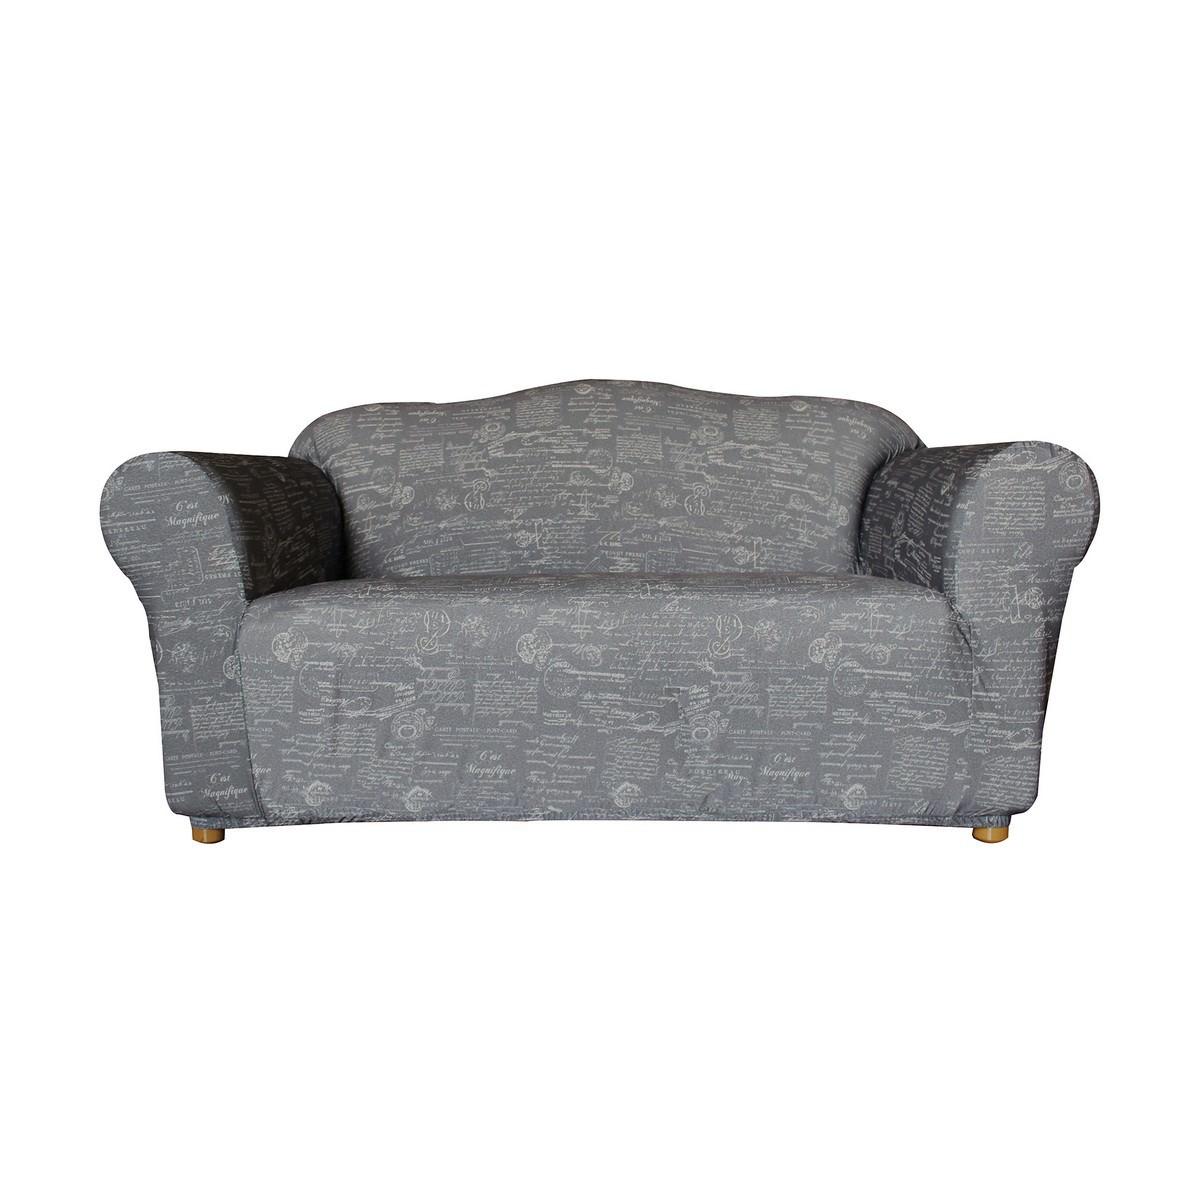 Sure Fit Statement Signature Sofa Cover, 2 Seater